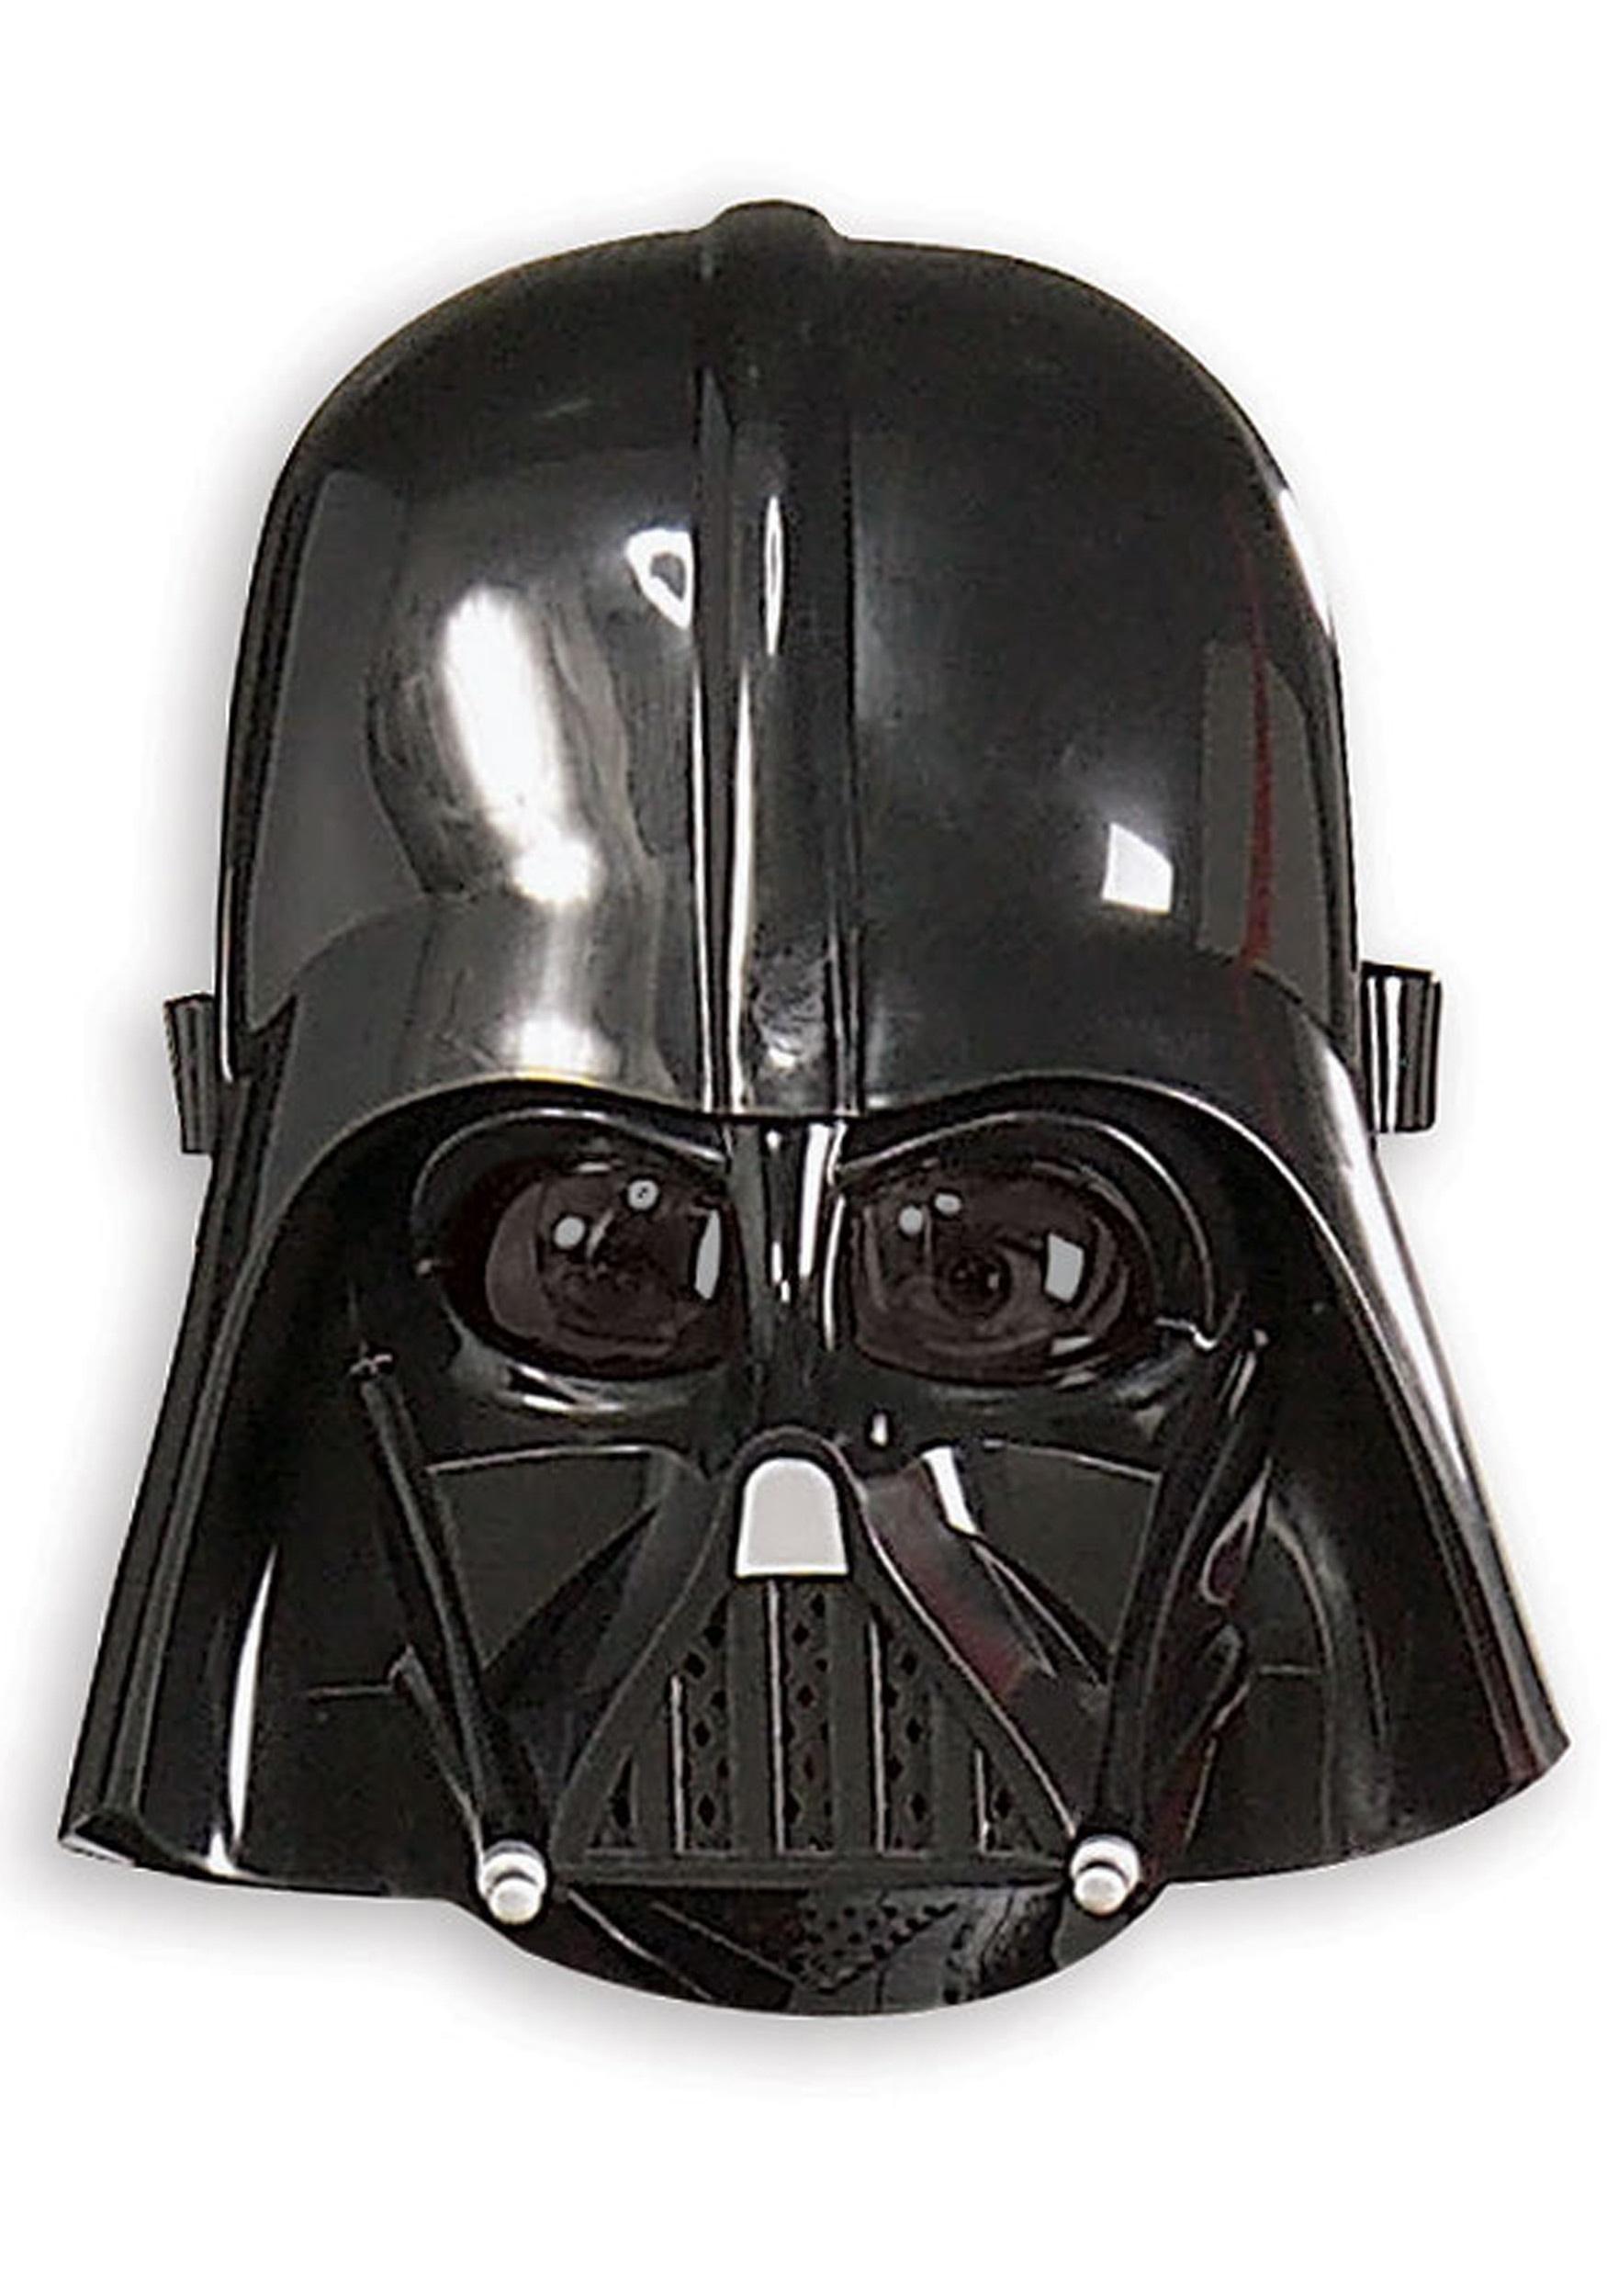 Kids Darth Vader Mask RU3441